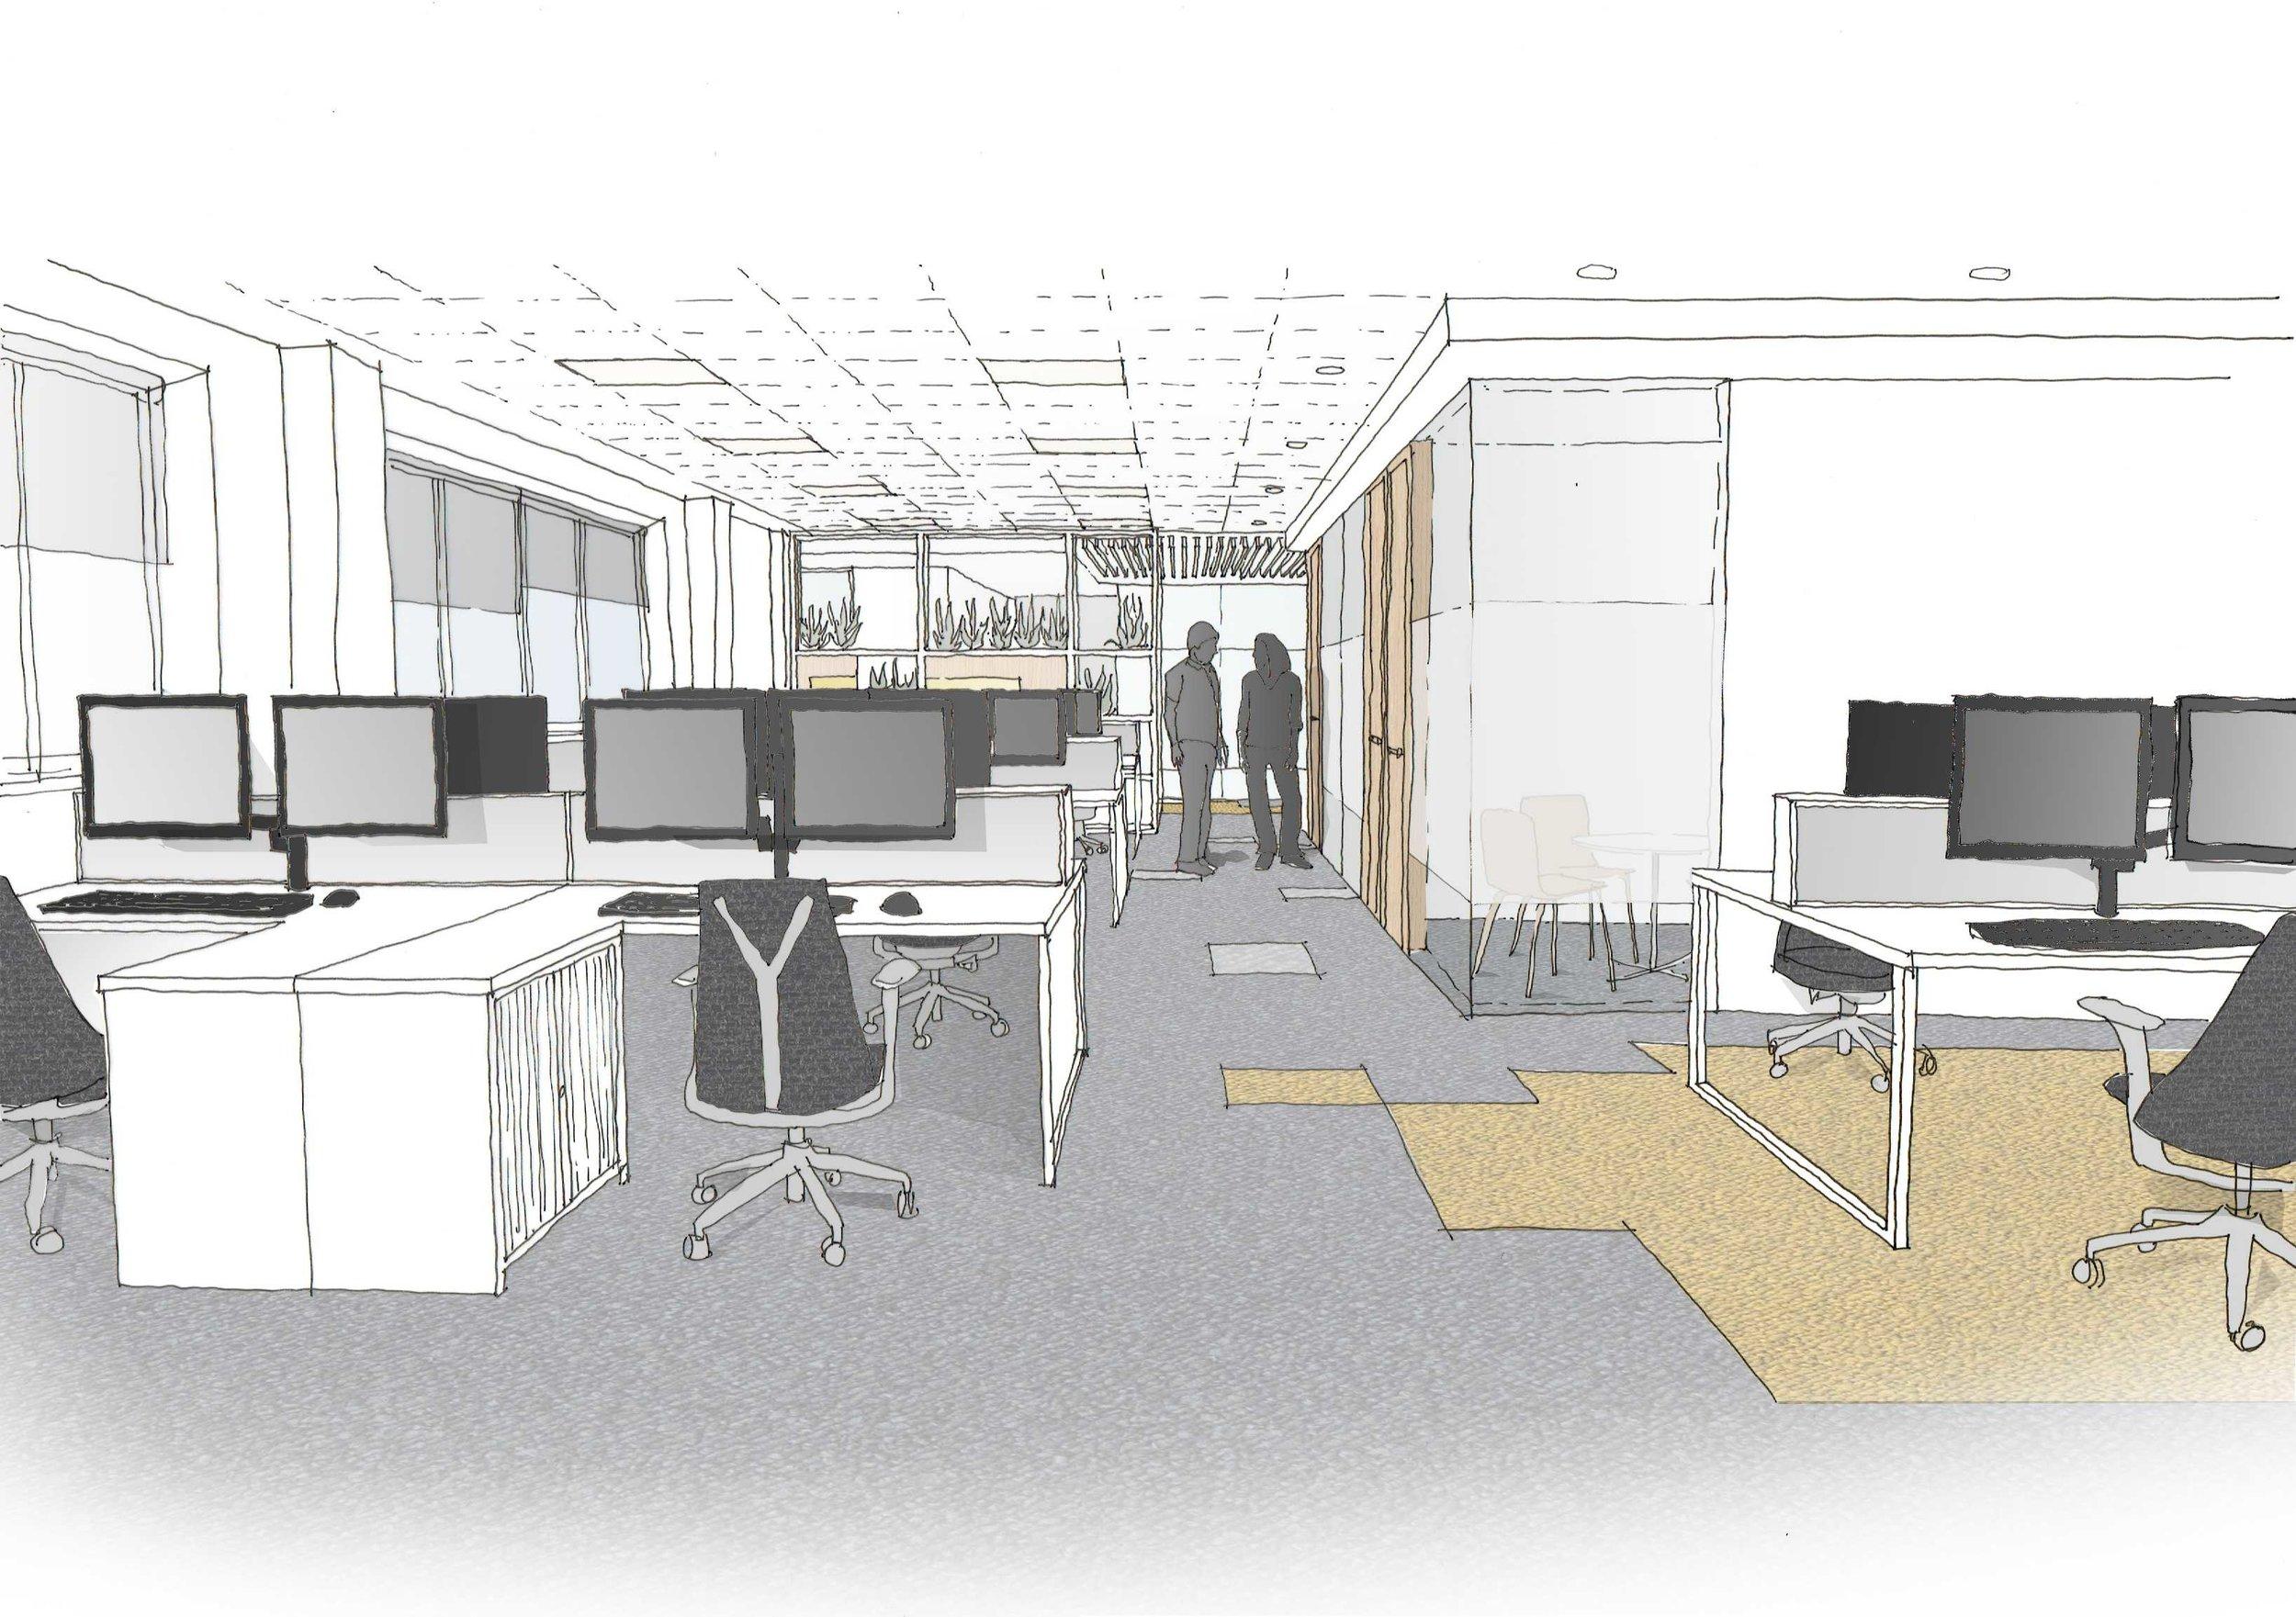 Office CONCEPT & DESIGN DEVELOPMENT